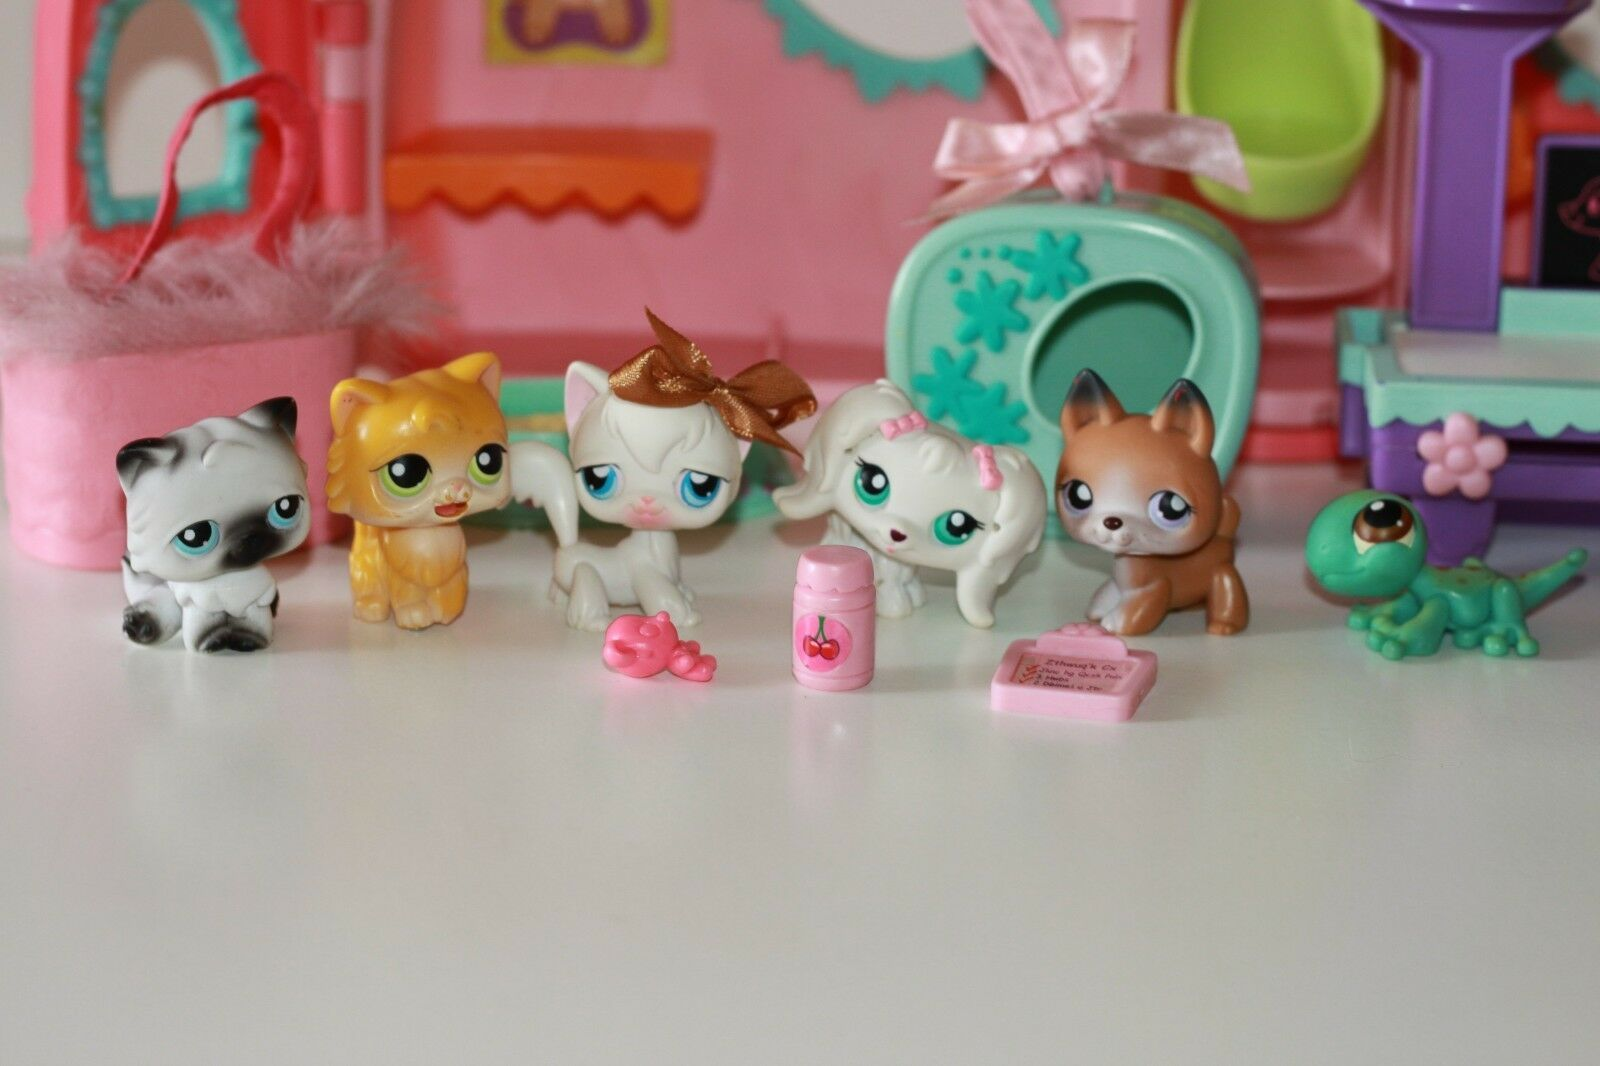 Hasbro Lps Littlest Pet Shop Get Better Center Accessories 6 Figures Bundle 1 Ebay Lps Littlest Pet Shop Littlest Pet Shop Little Pets